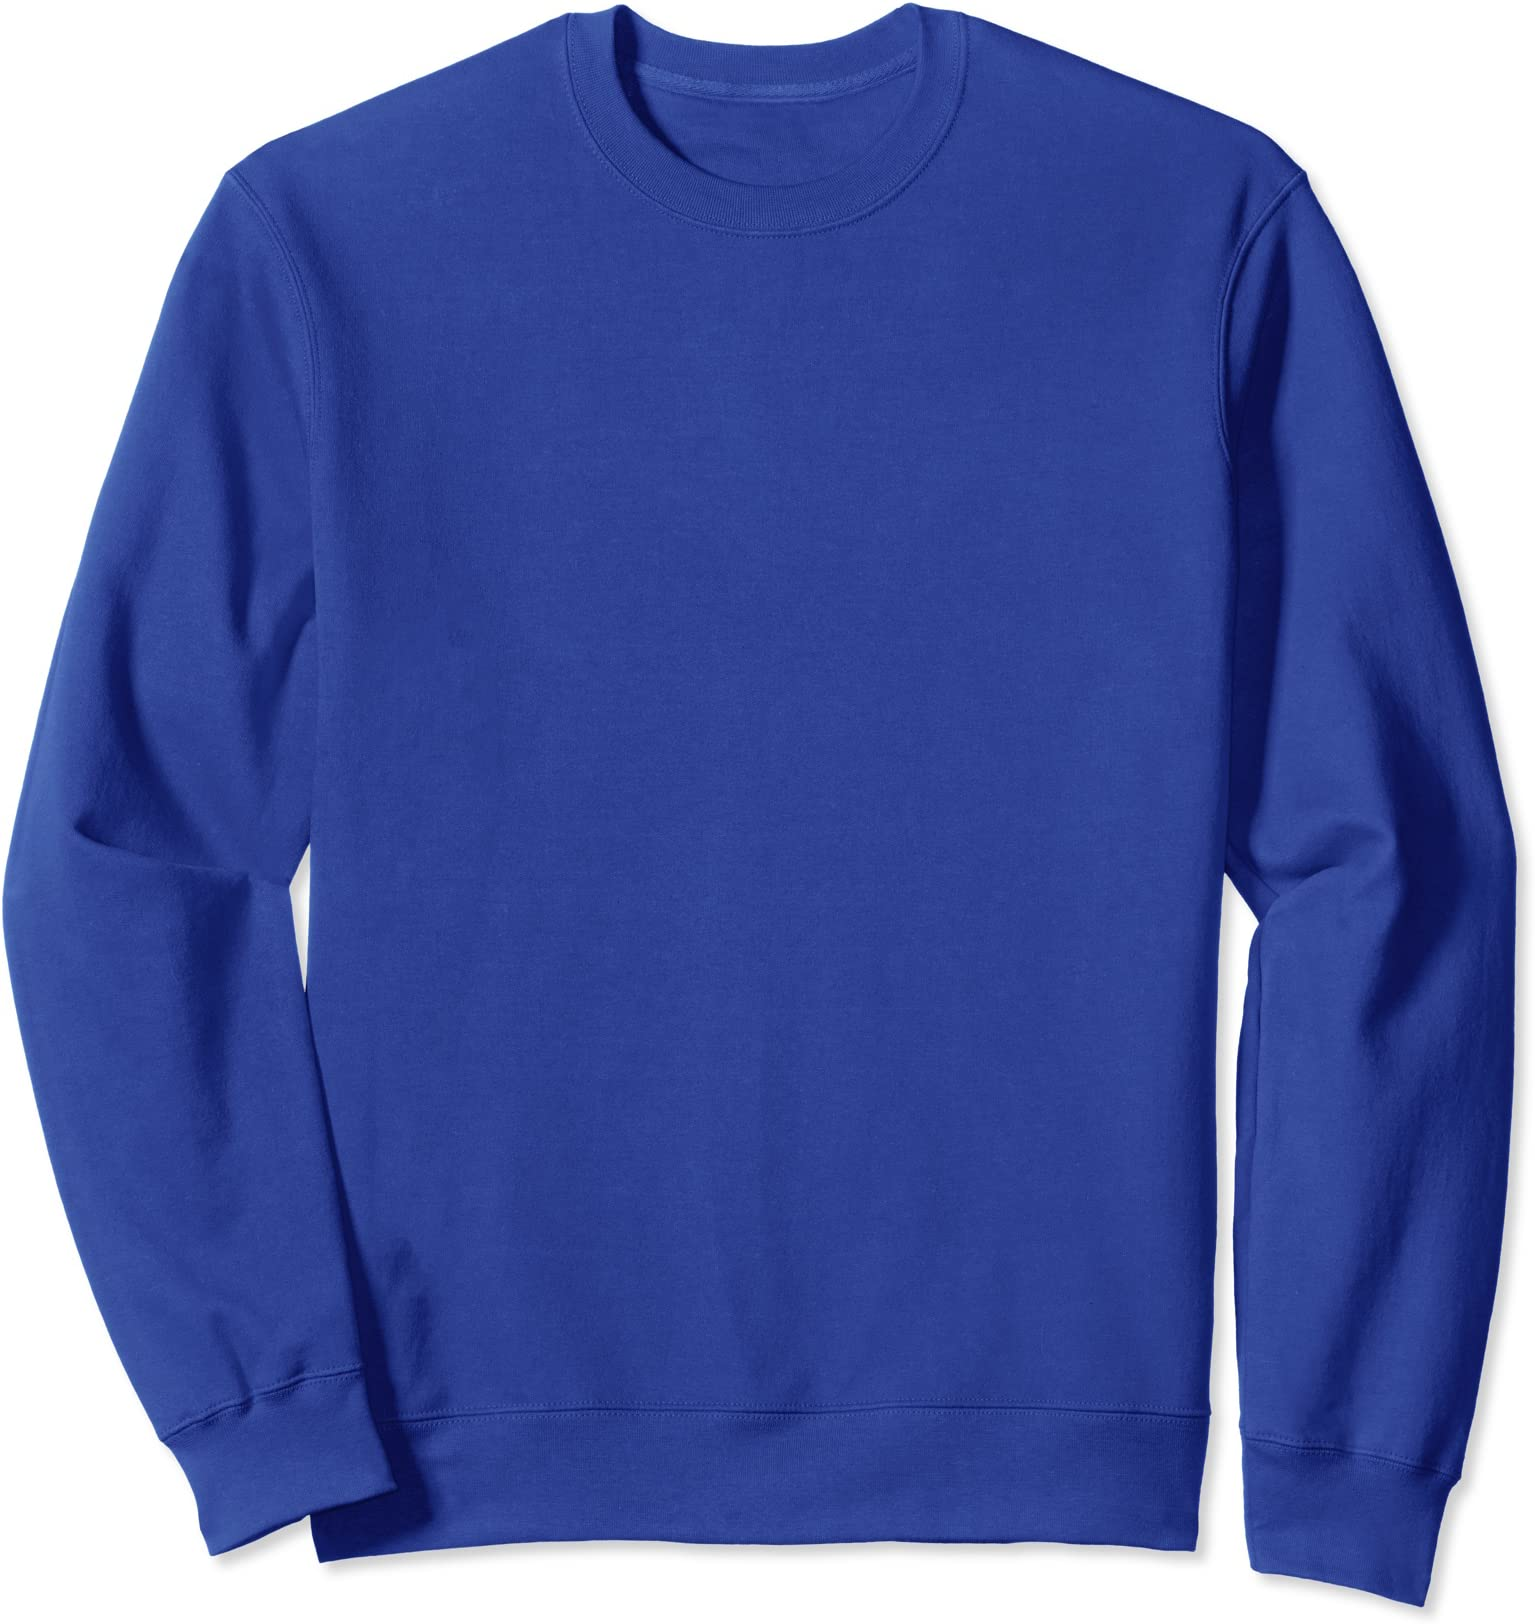 T-Shirt Xmas Funny Top Christmas Snoop Dogg Ho/'s Ho/'s Ho/'s Sweatshirt